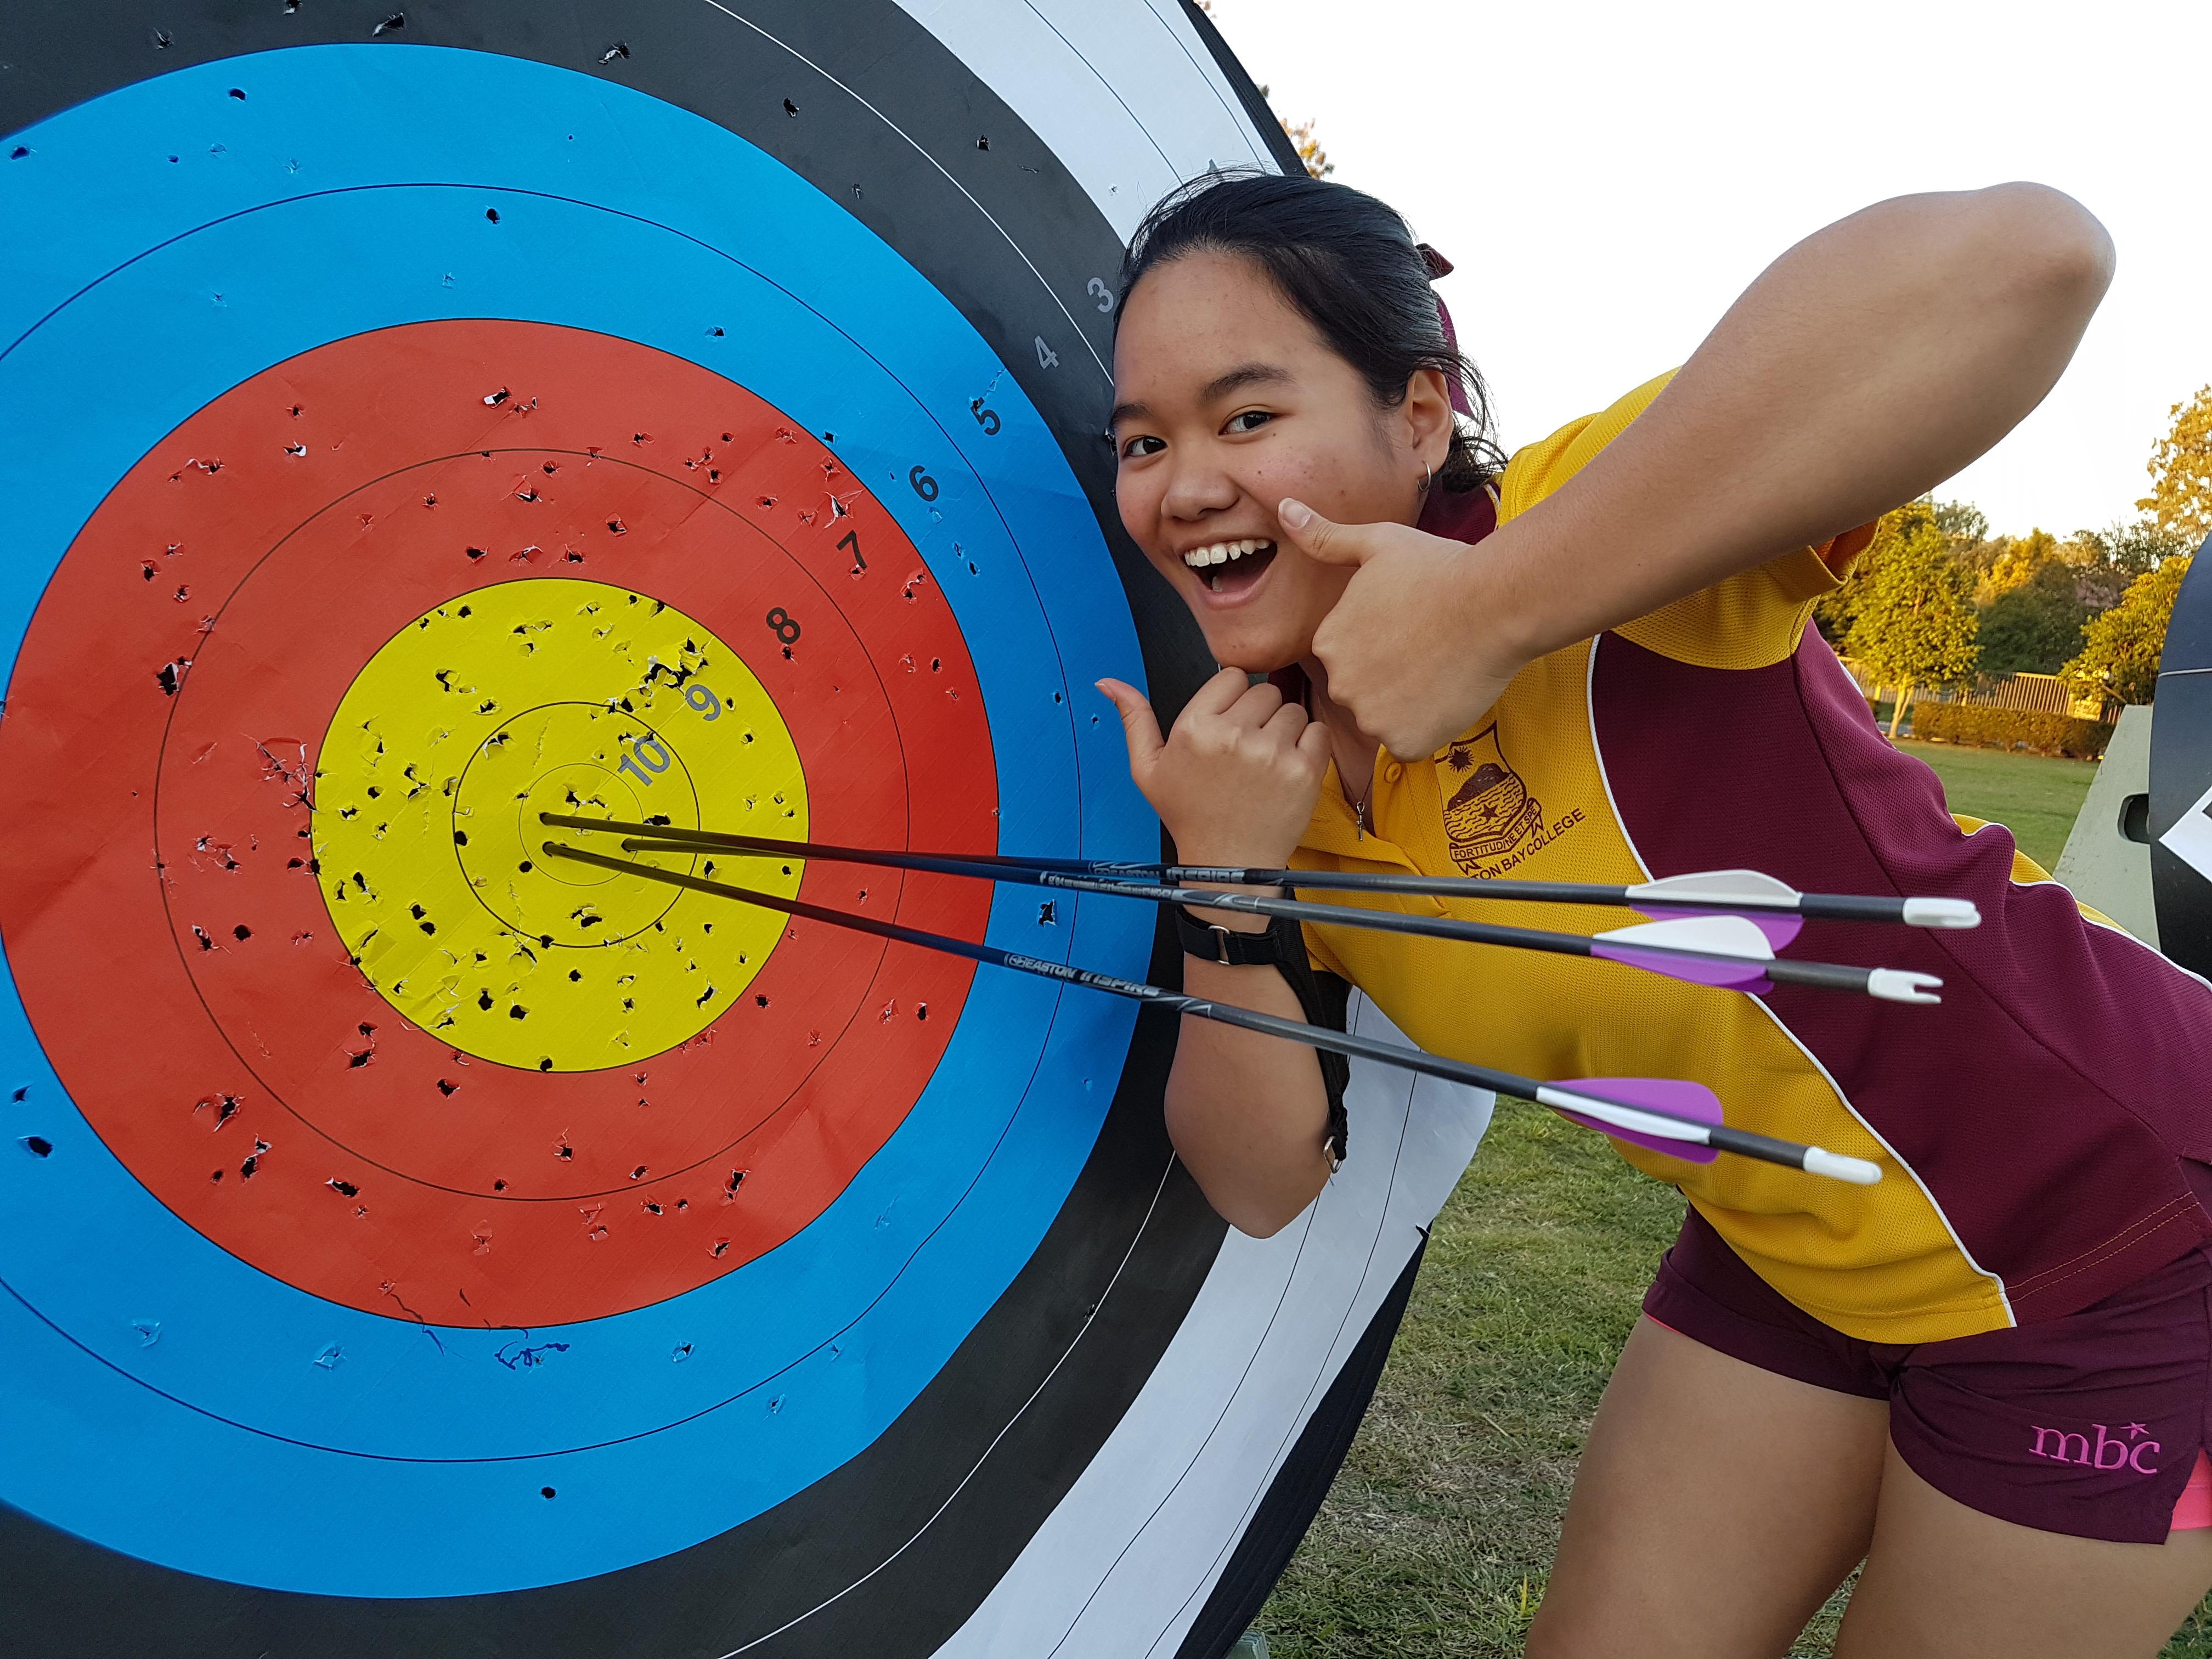 School archery